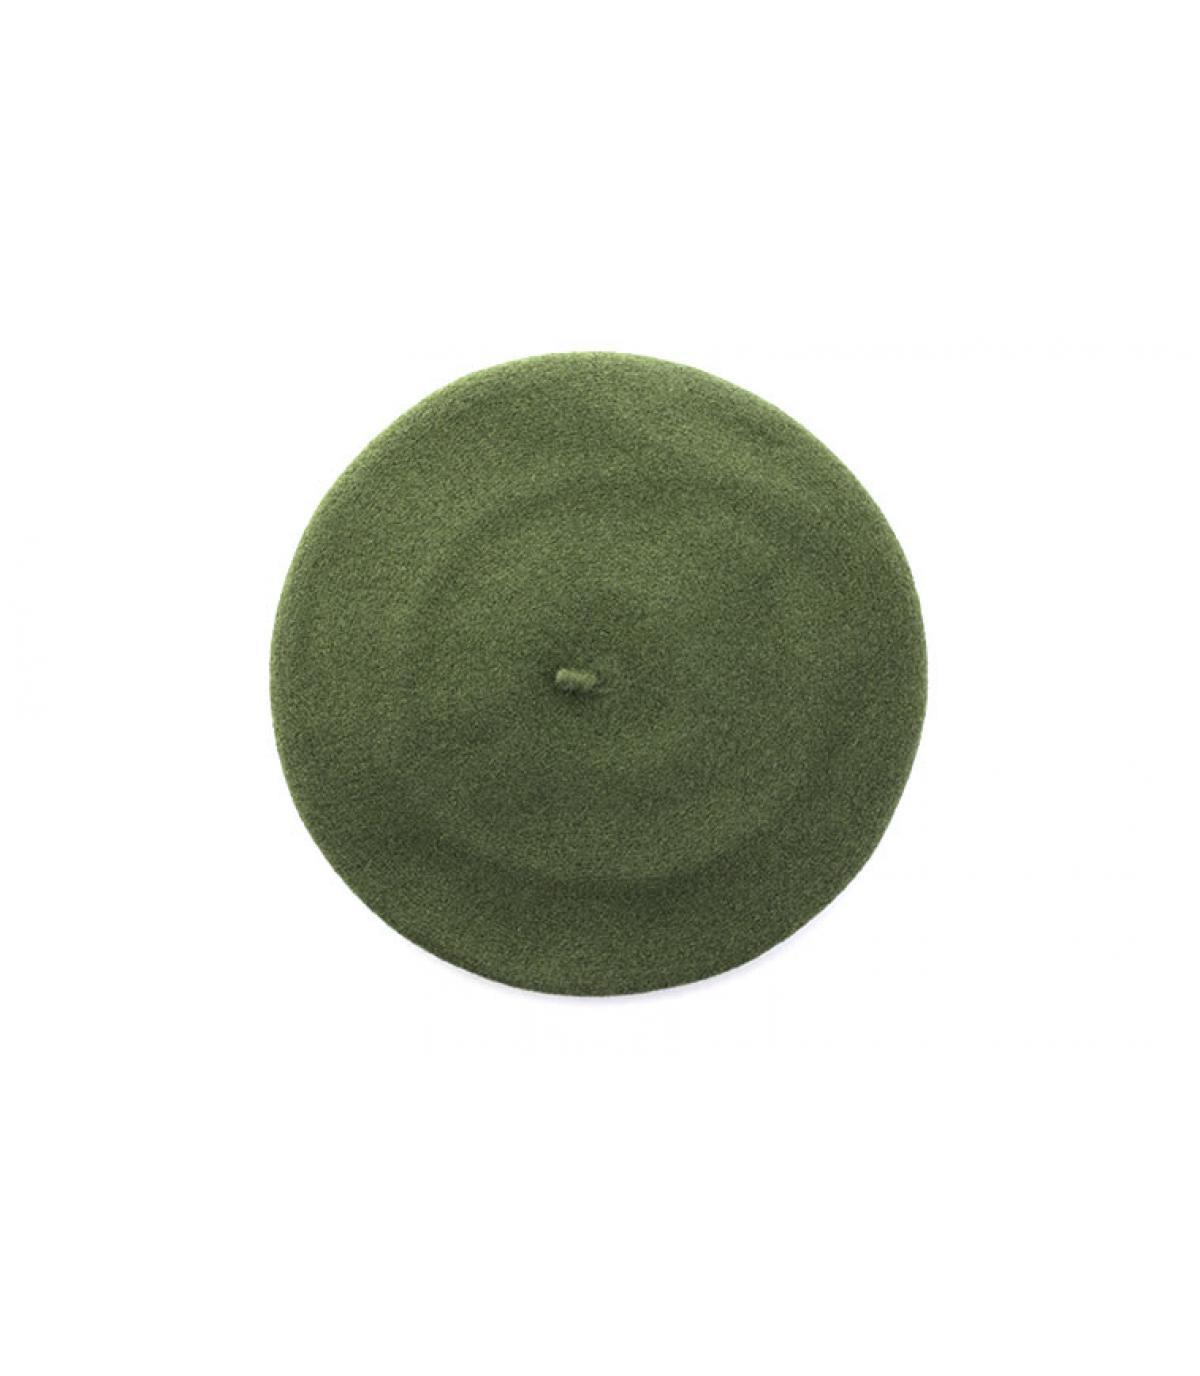 béret bord-côte vert